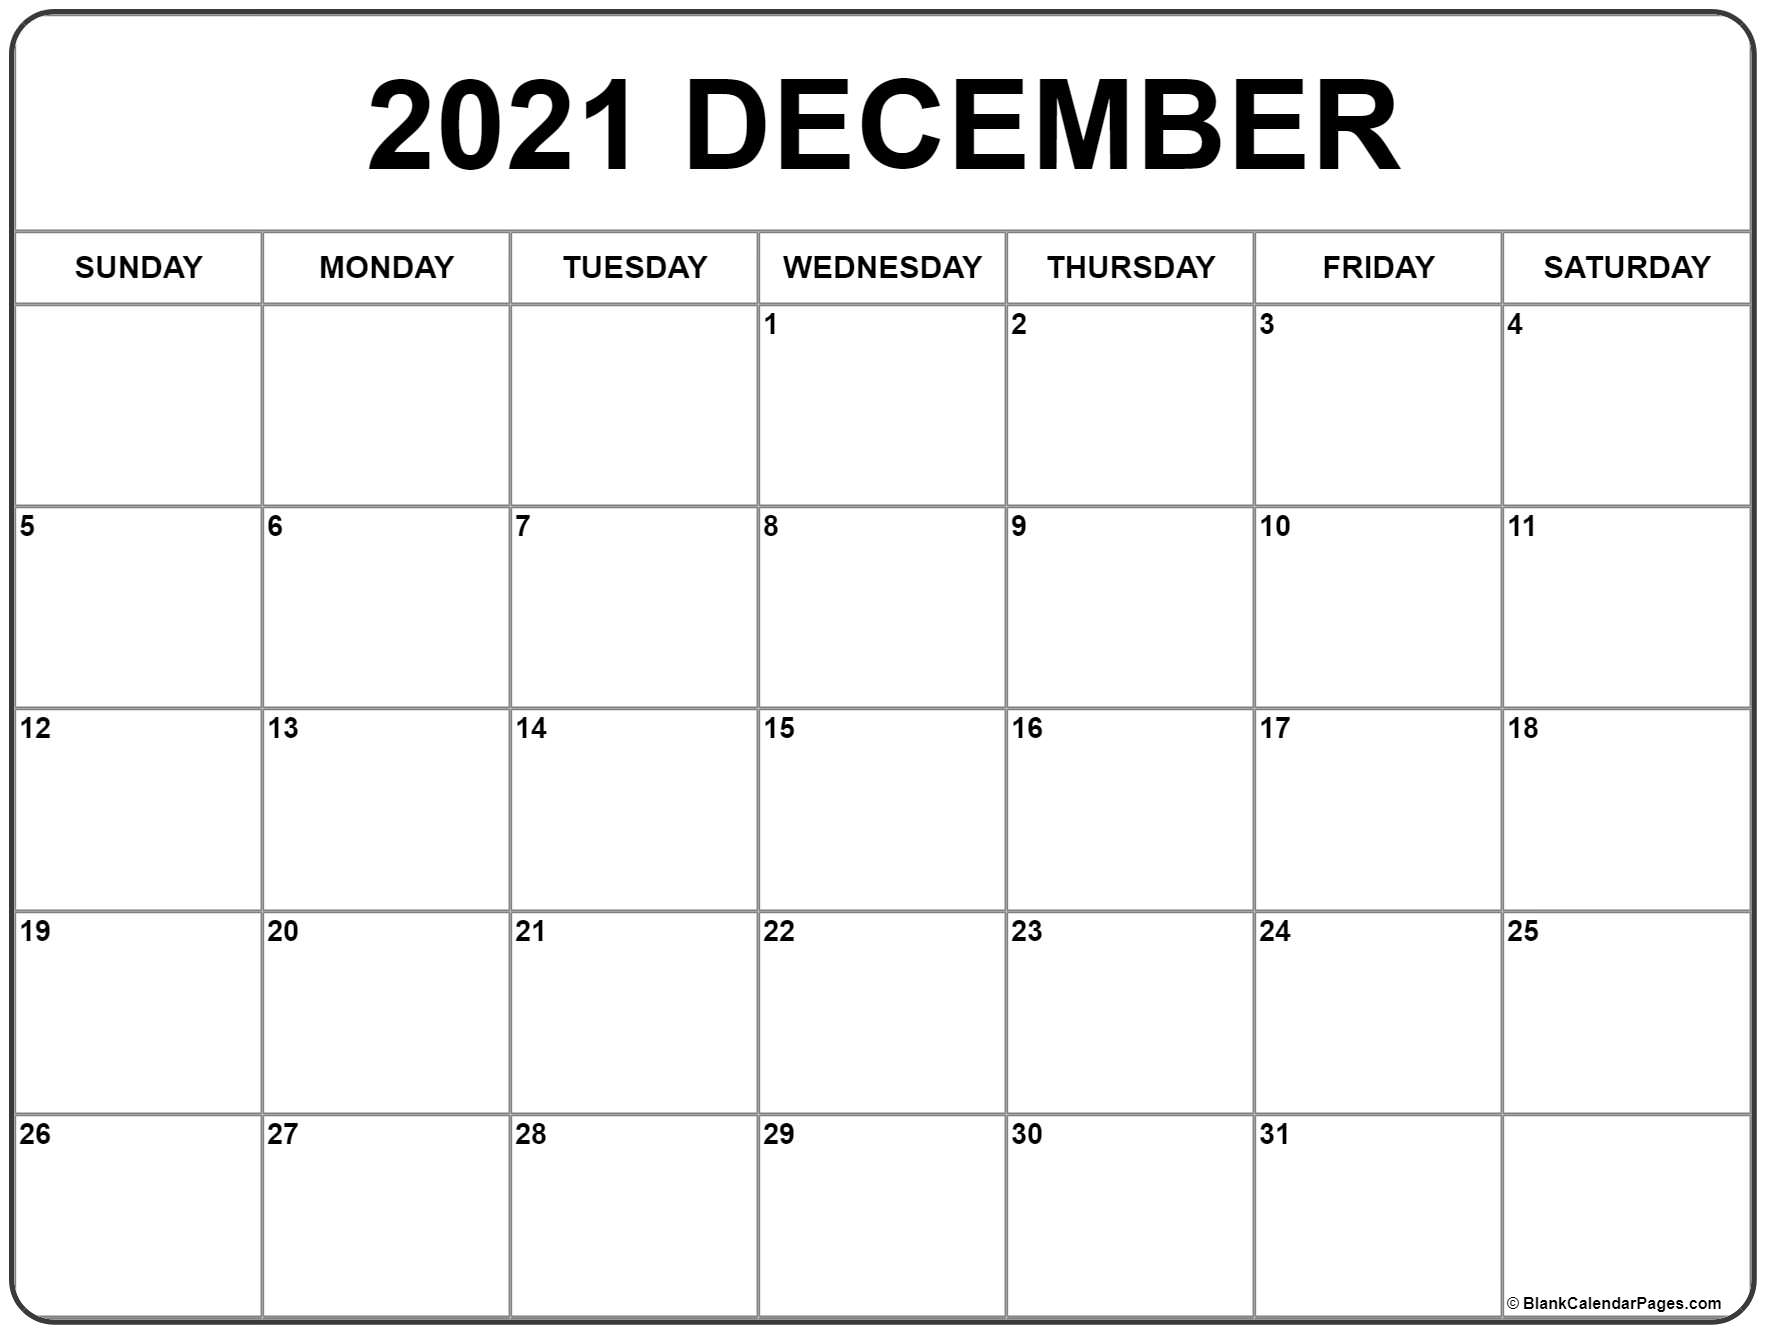 Get Free Printable Monthly Calendar December 2021